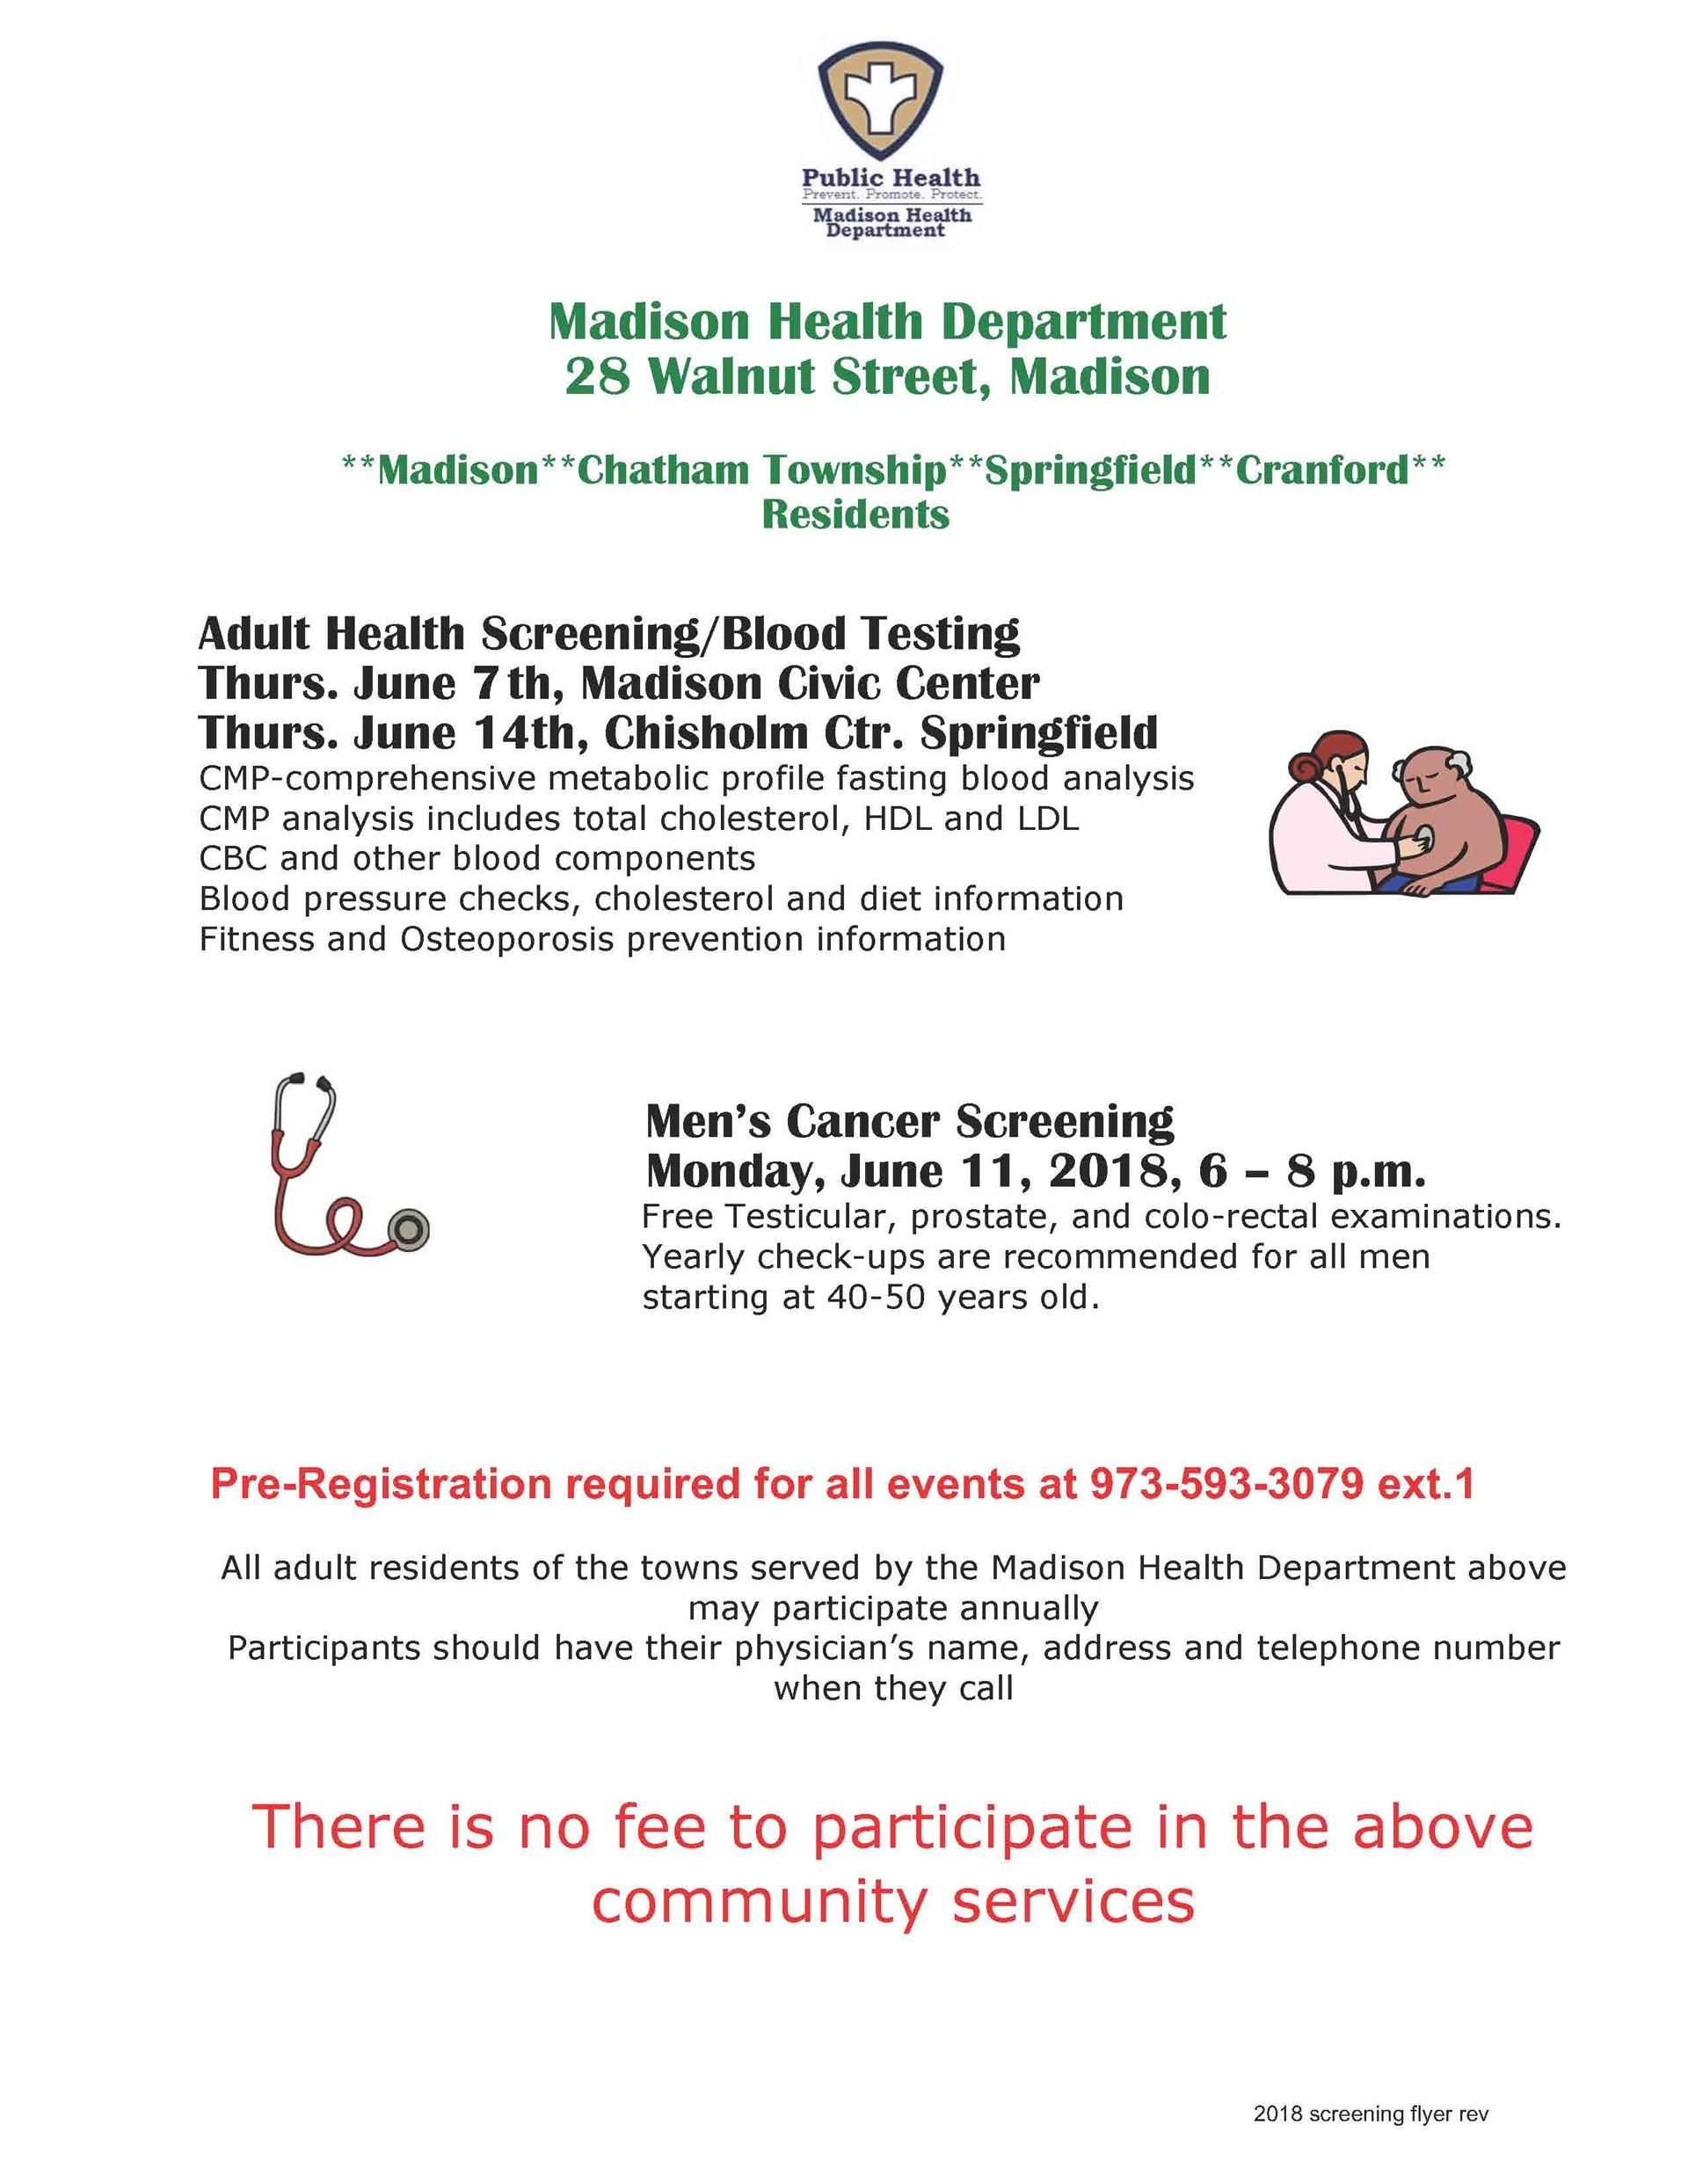 Free Adult Screening & Blood Testing - Madison Health Department ...